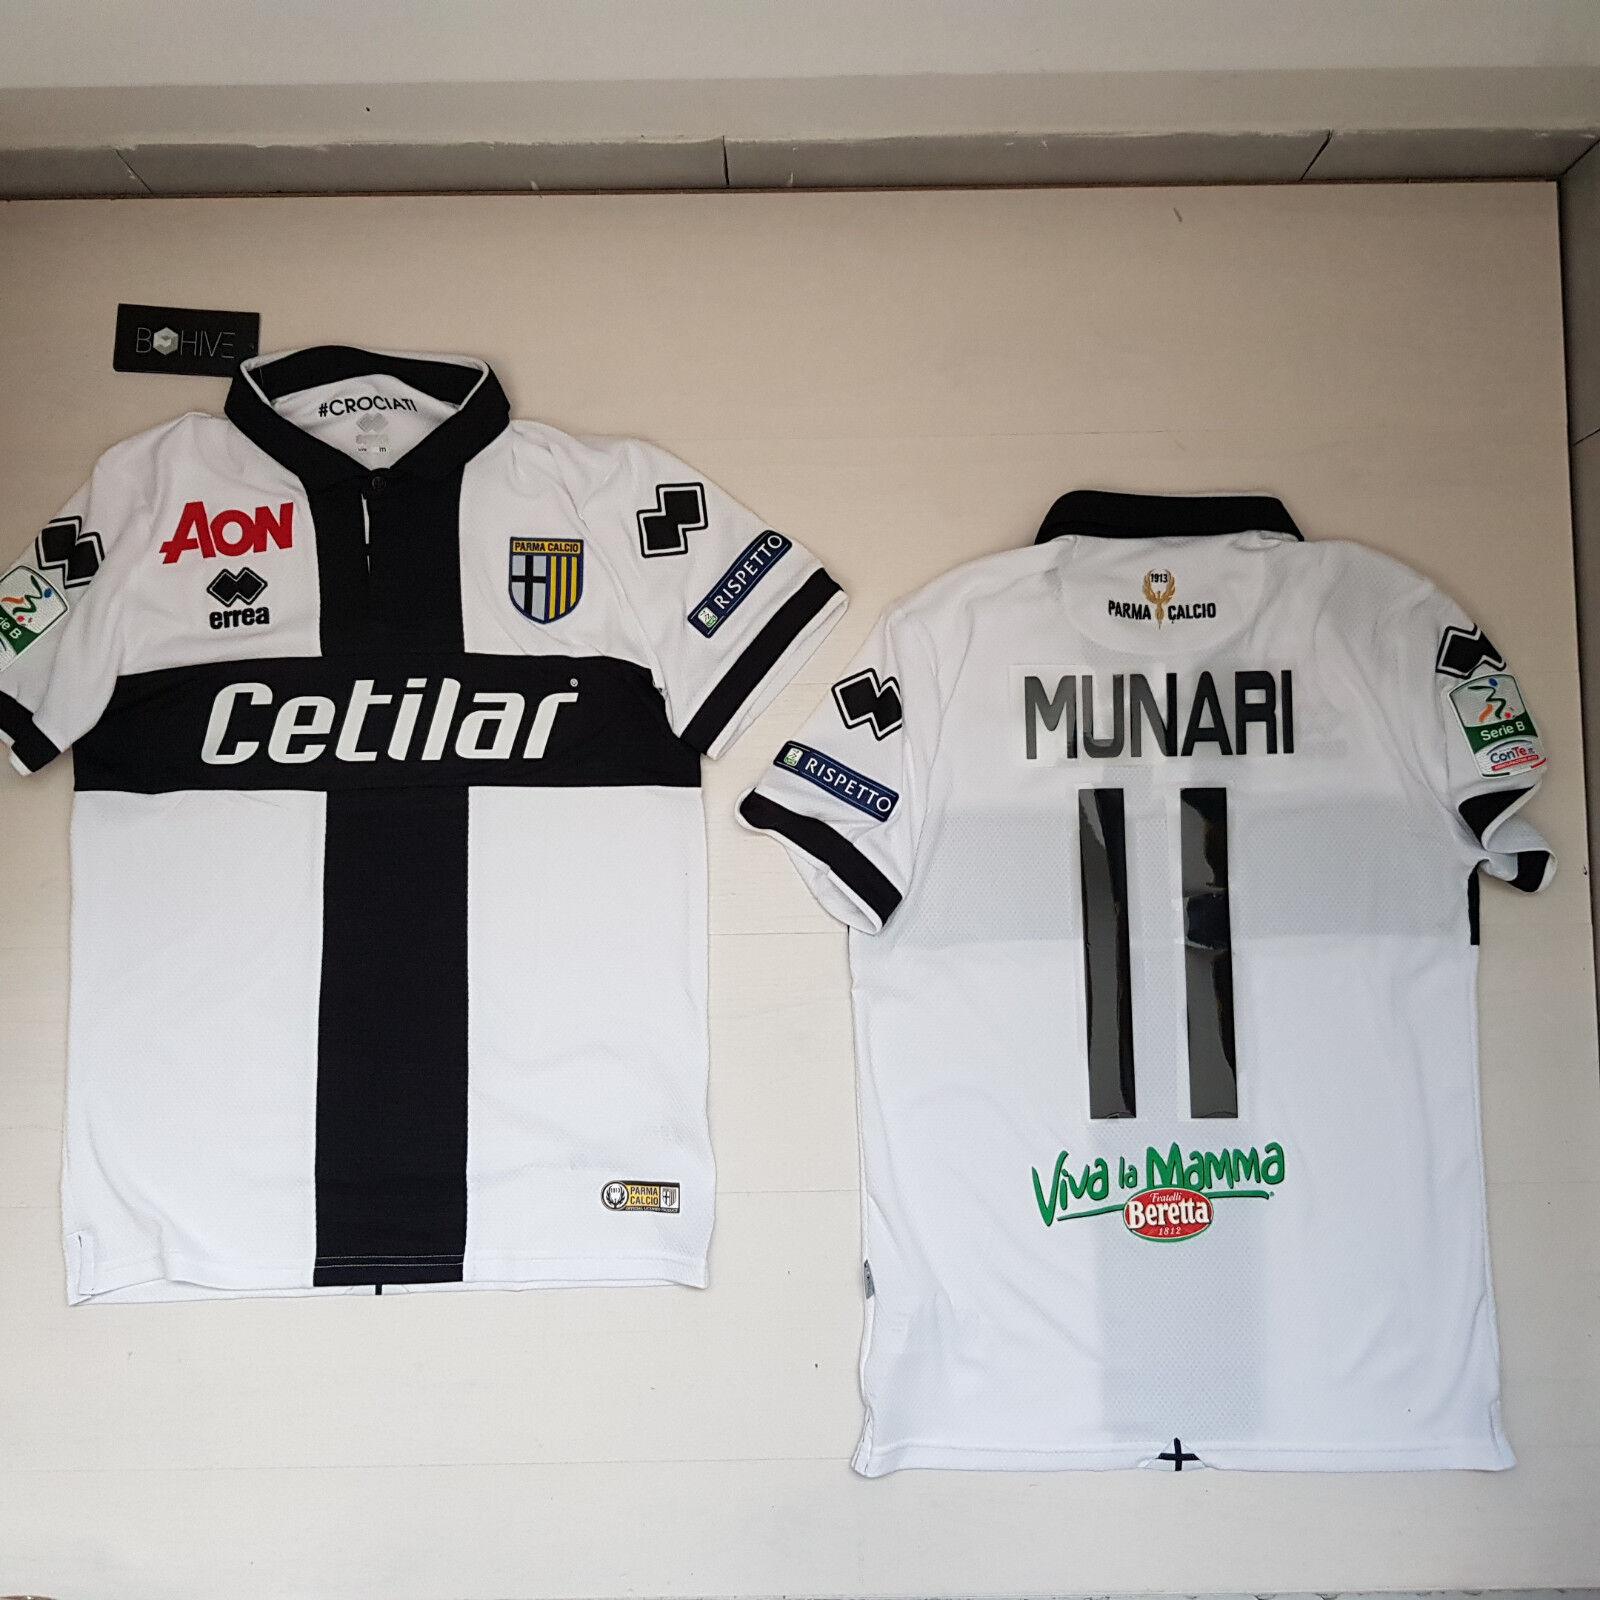 2017 Errea Parma T-Shirt Munari 11 Series B Match Shirt Jersey